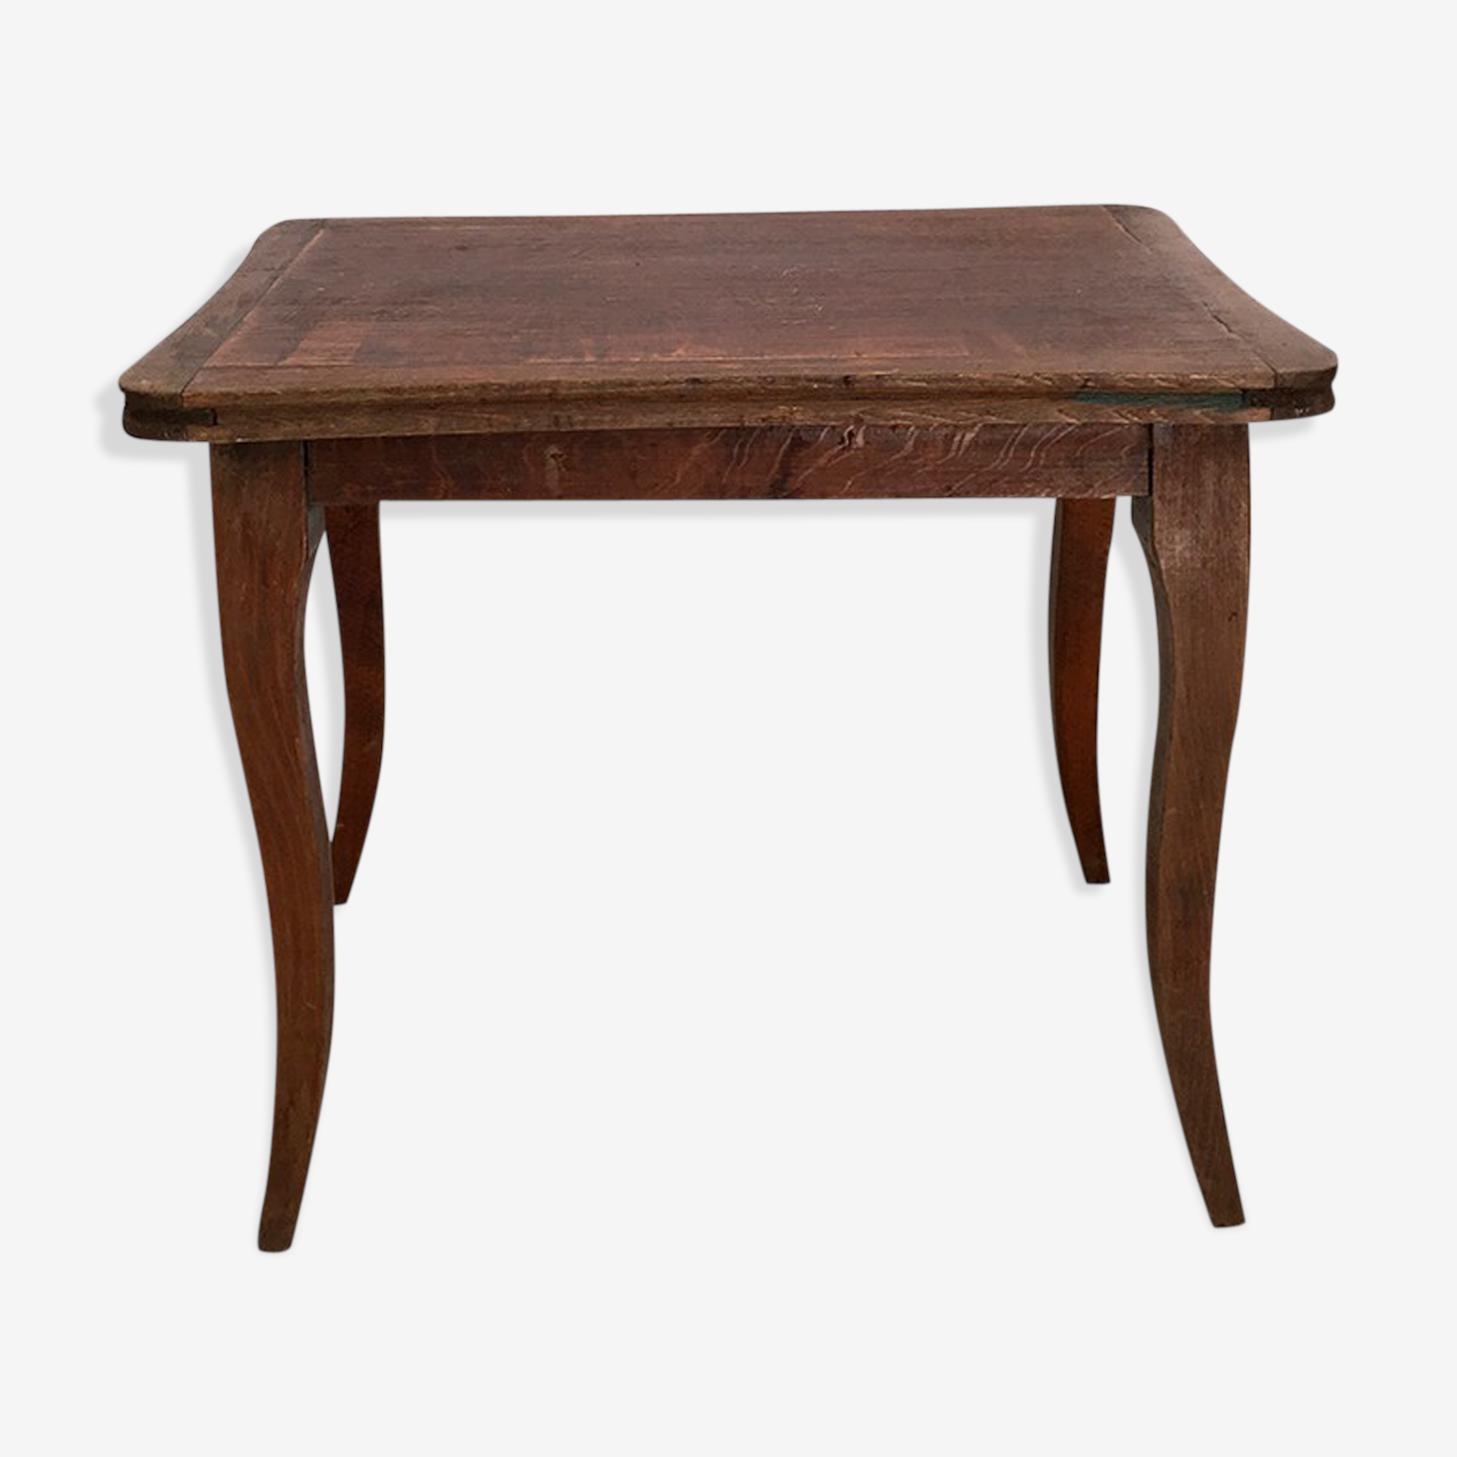 Vintage side table 30s